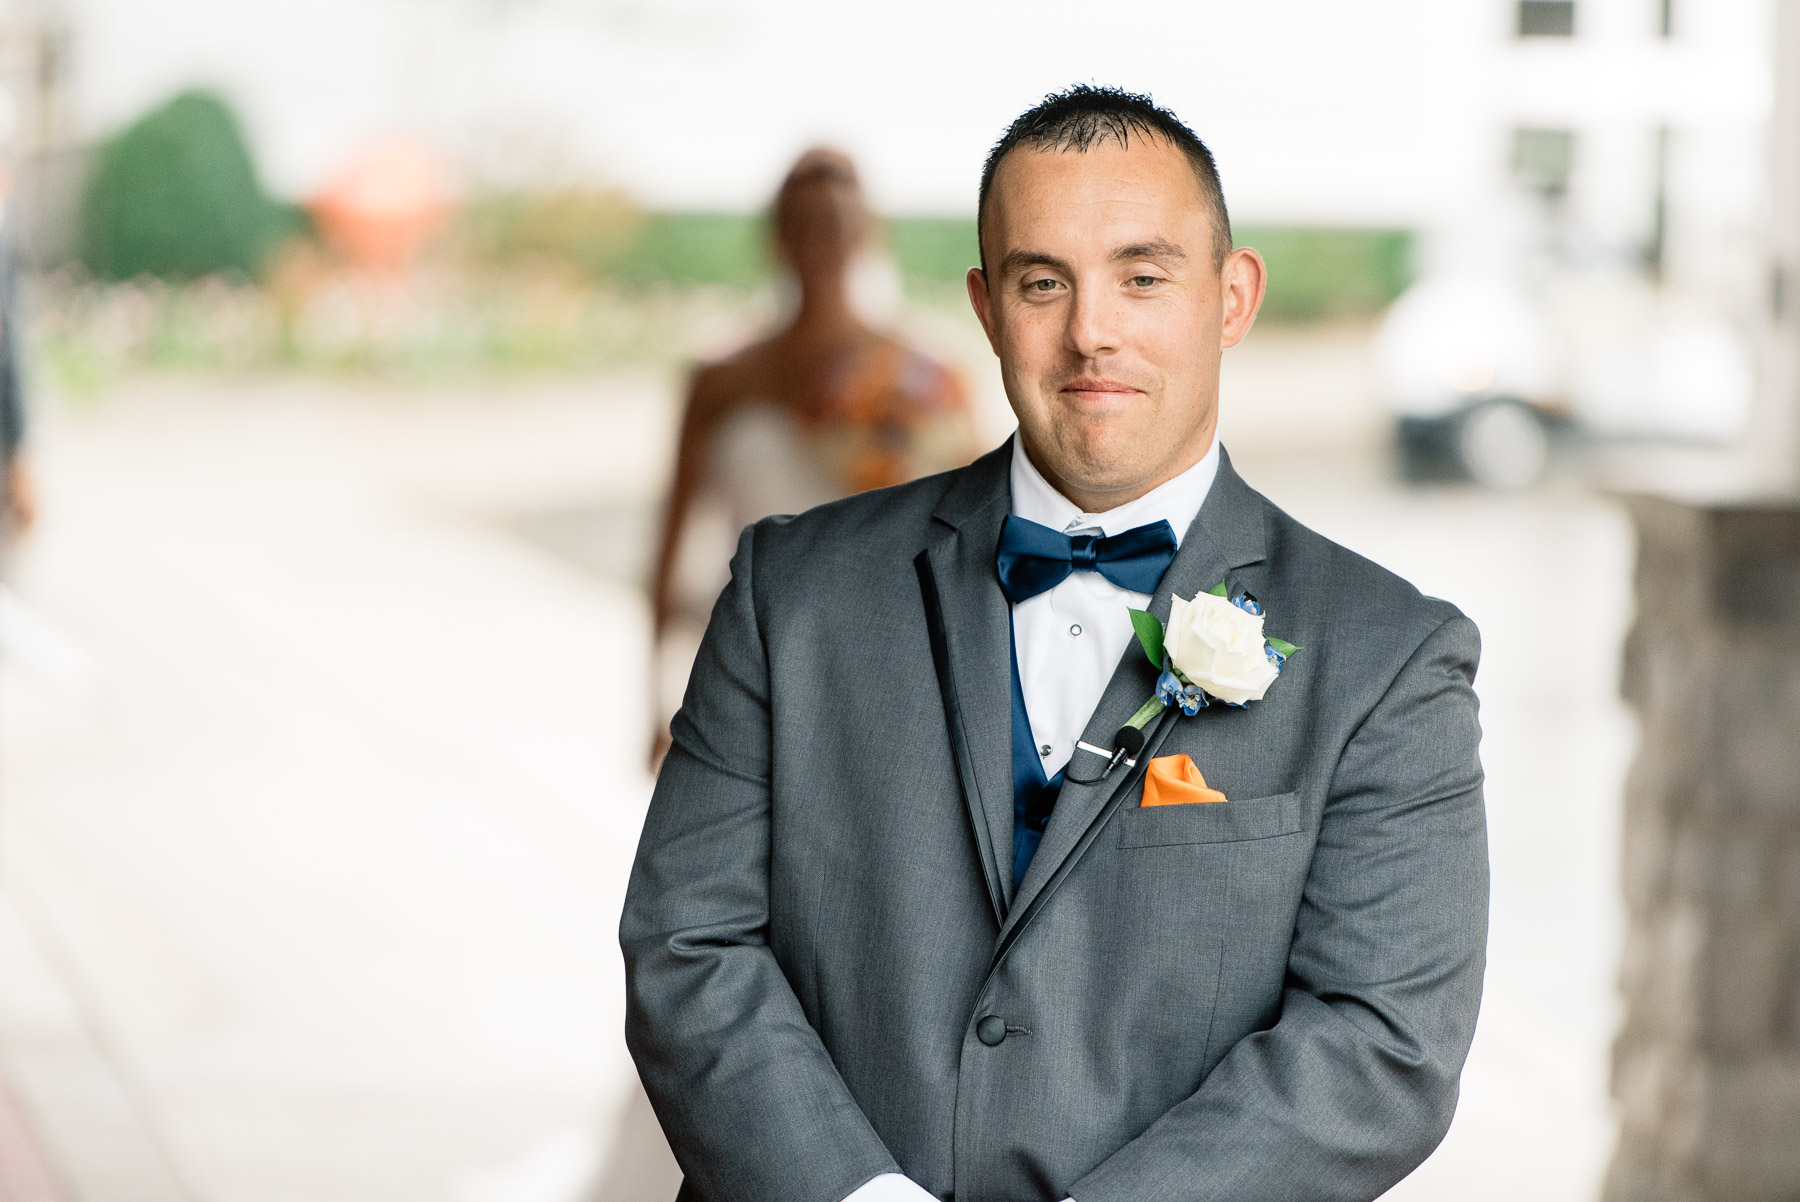 springfield-country-club-wedding-photo-22.jpg